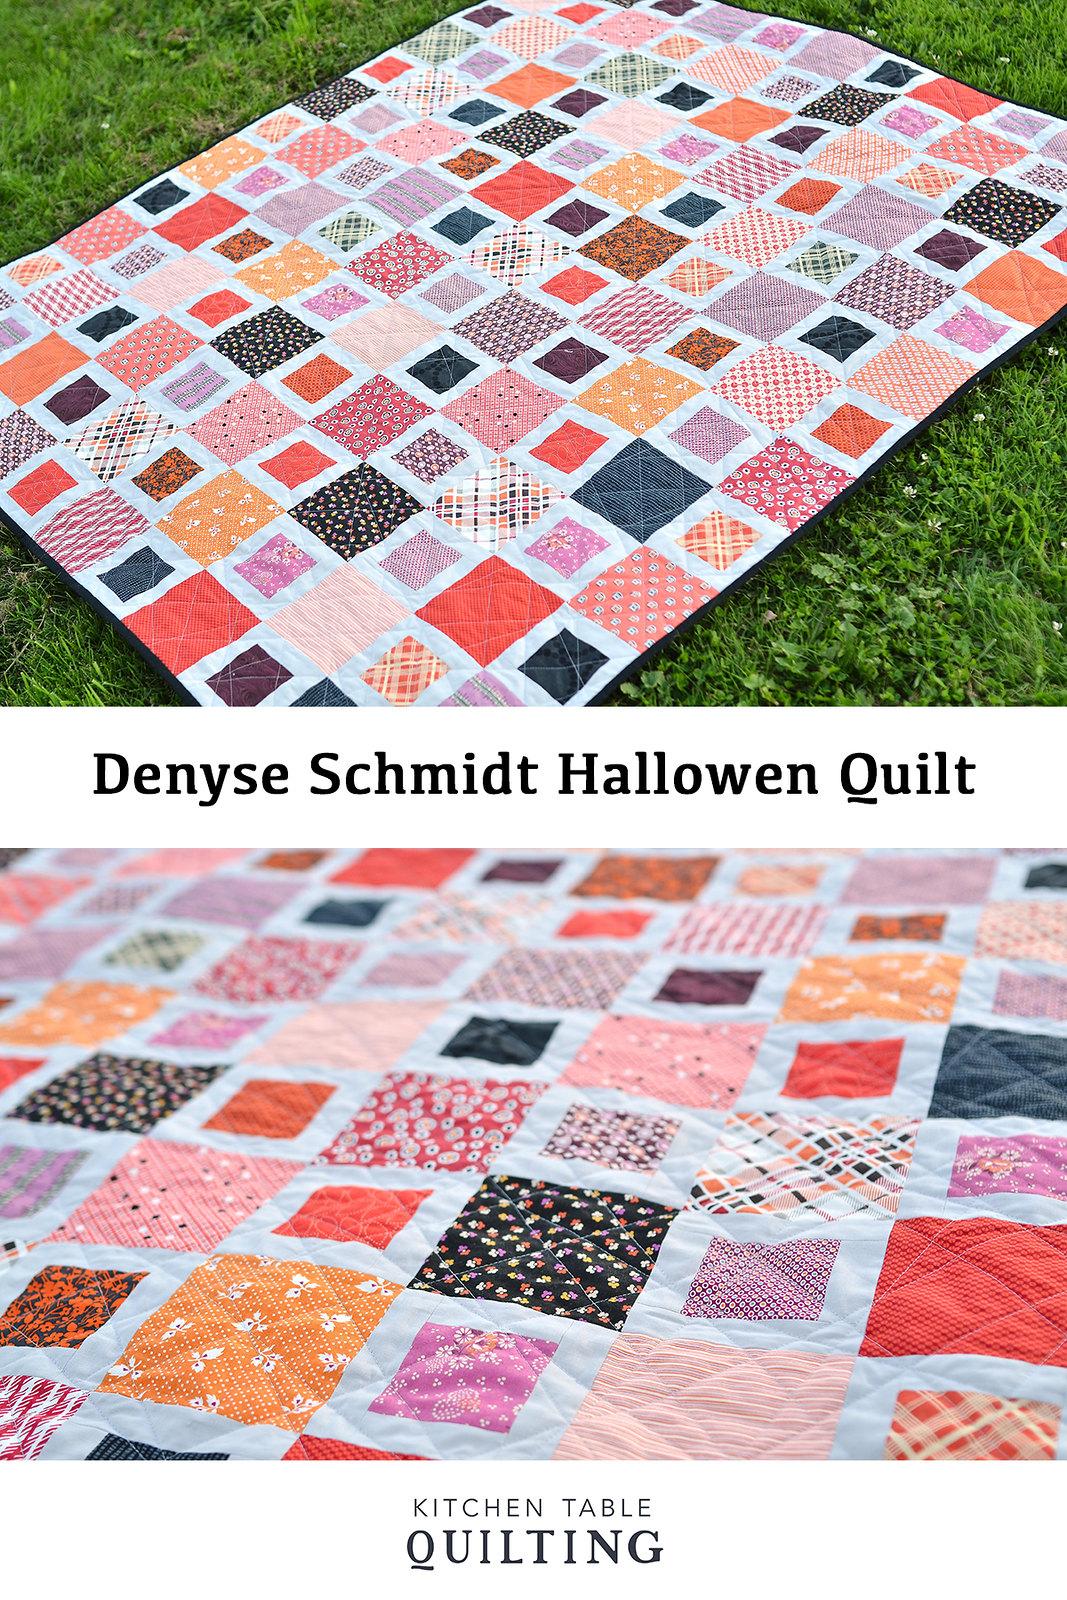 Denyse Schmidt Halloween Quilt - Kitchen Table Quilting #quilt